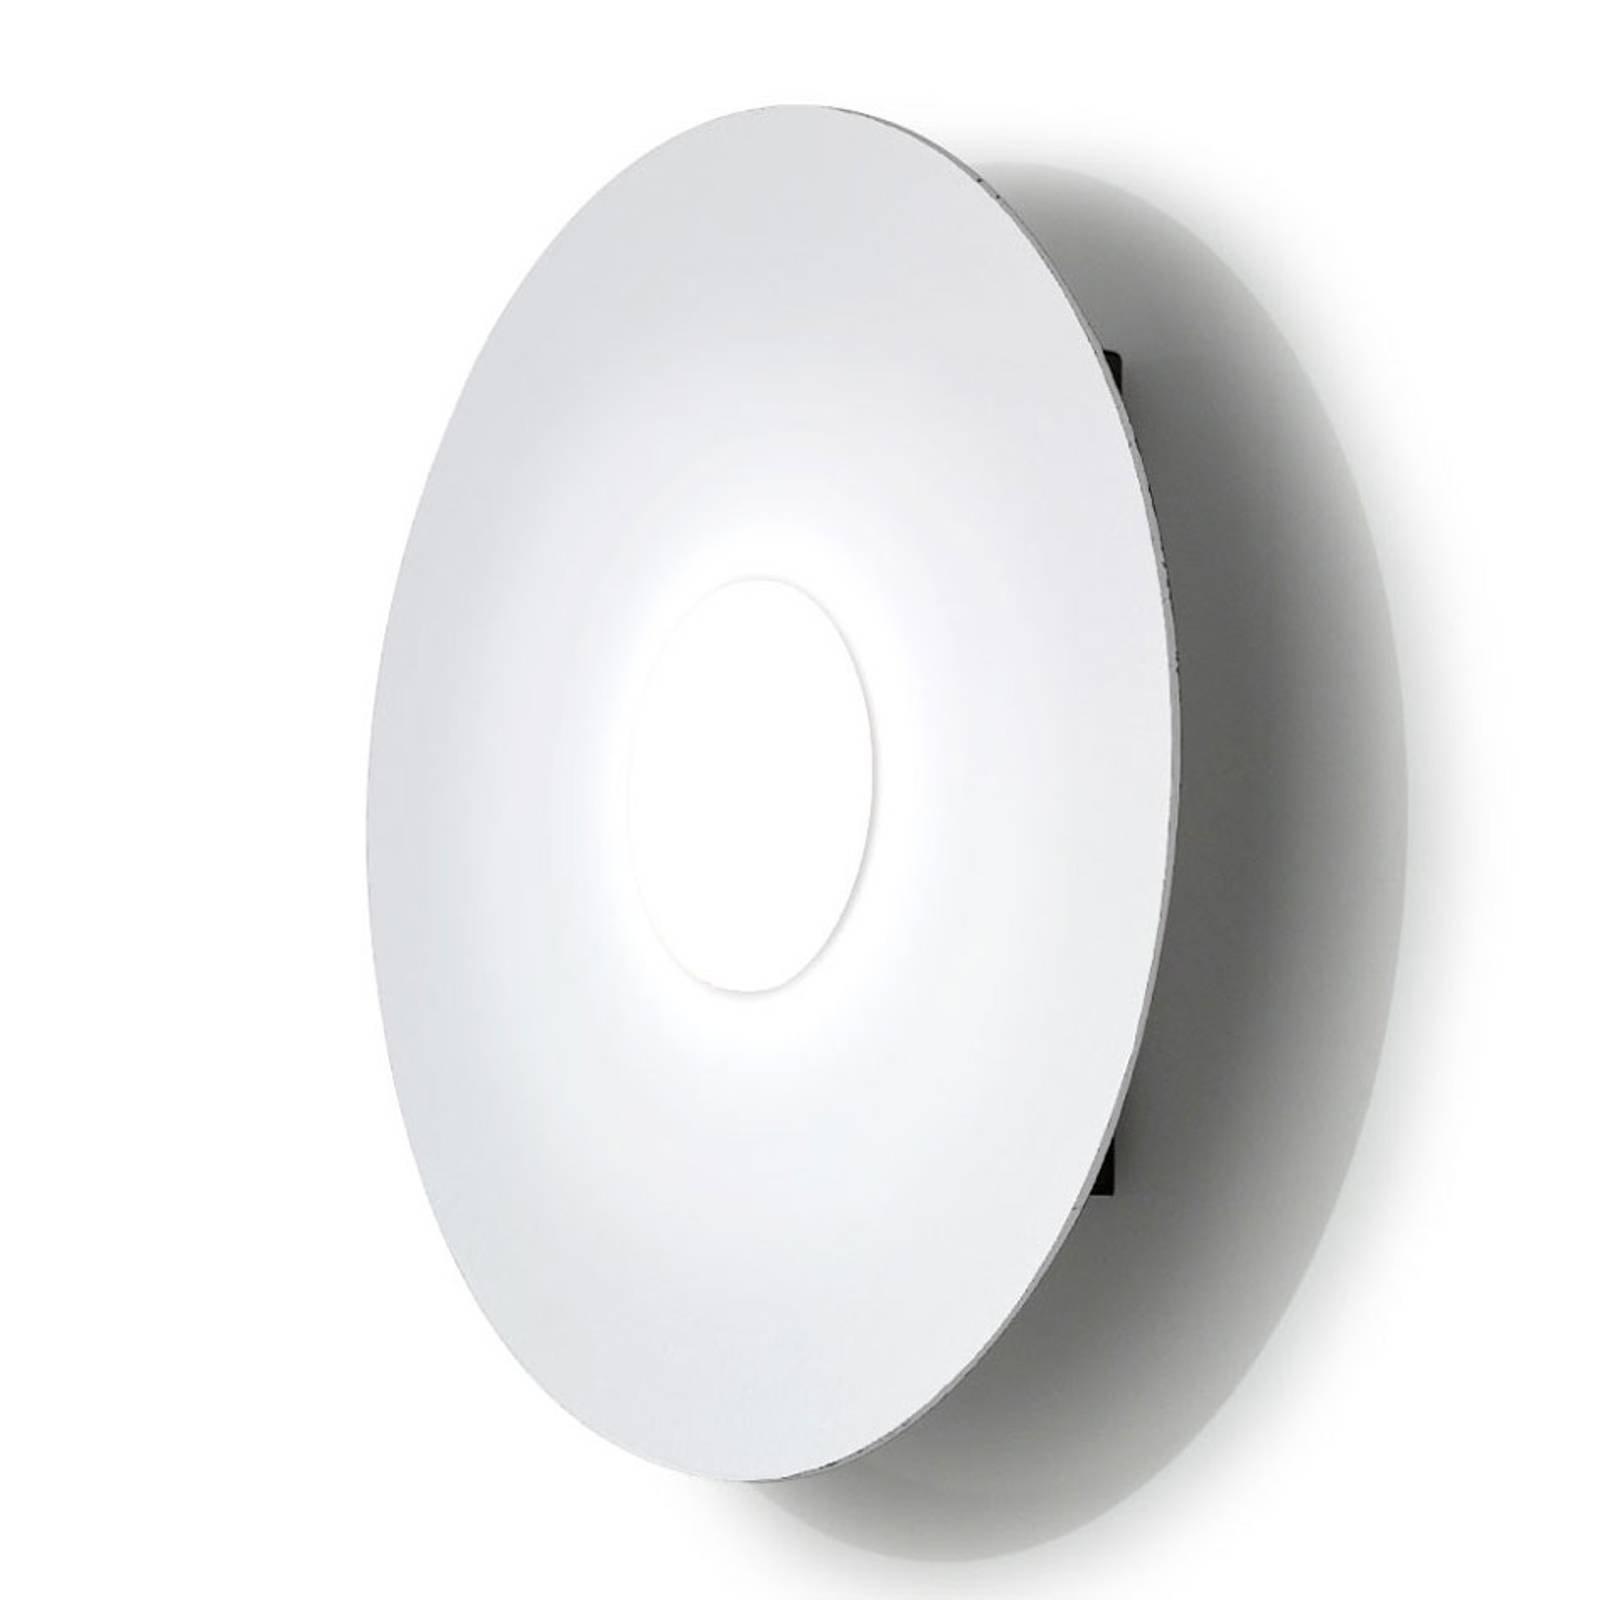 LED-vegglampe Circle, hvit, 1 lyskilde, dimbar